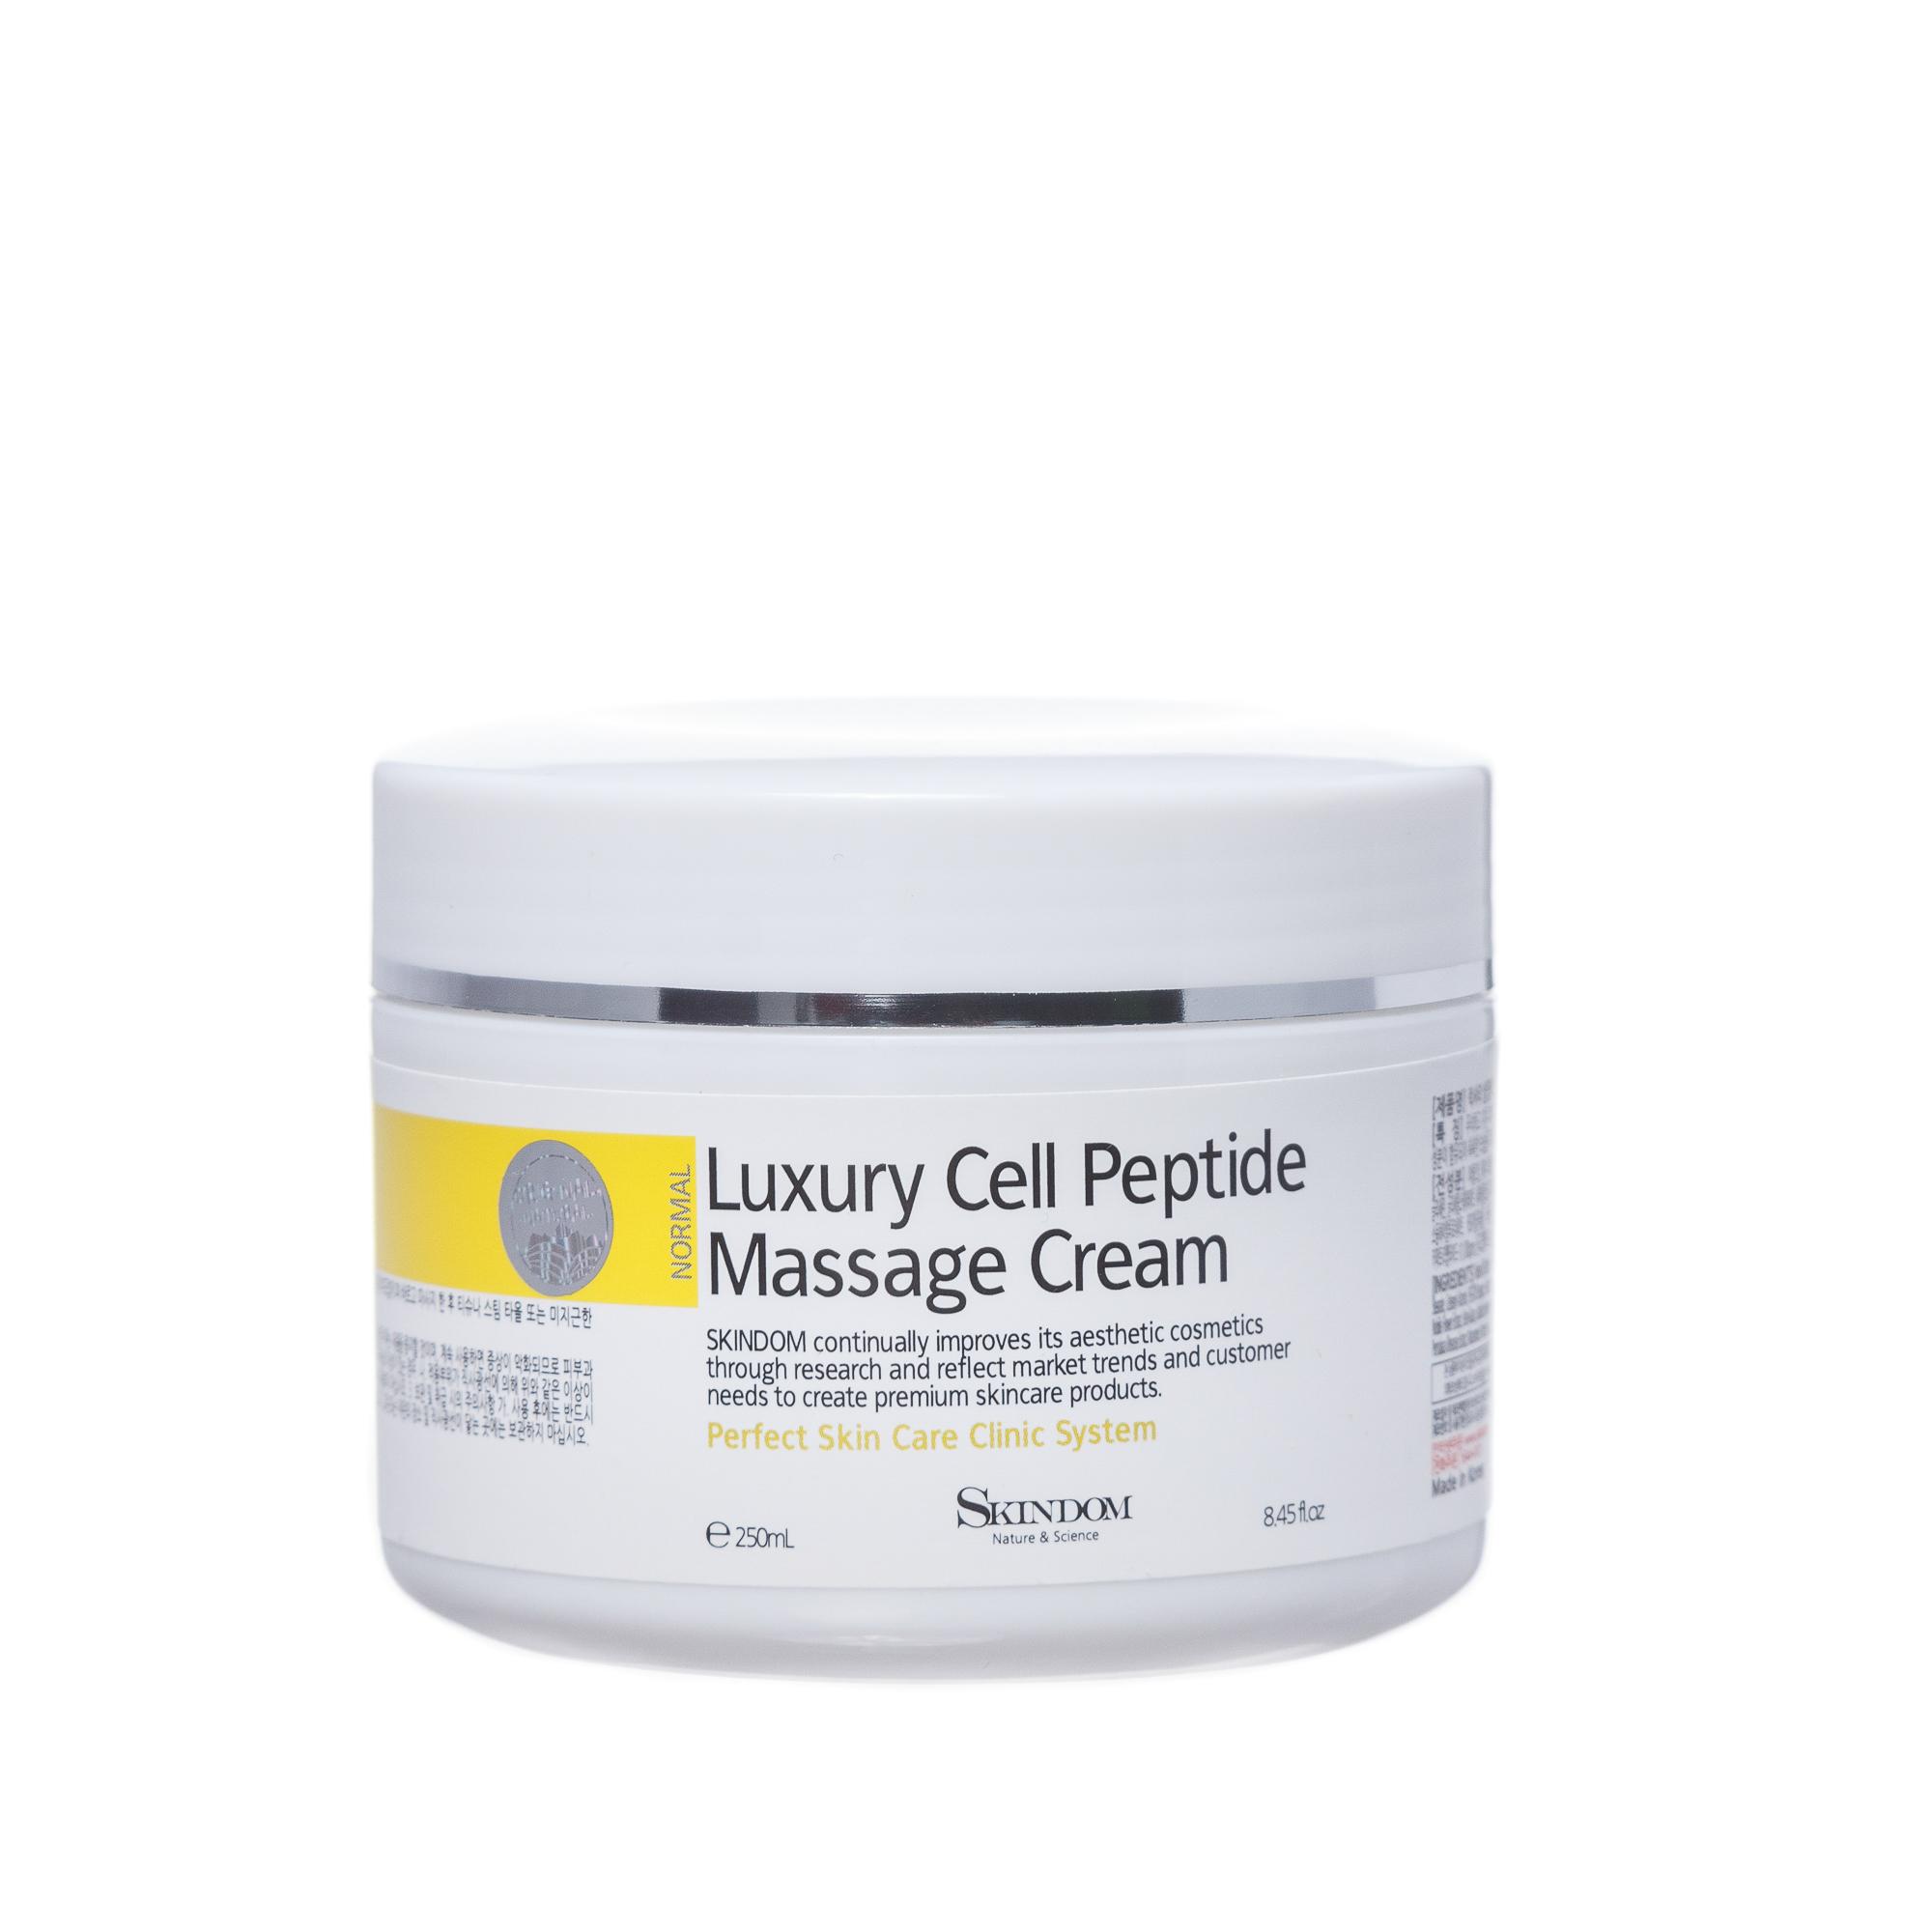 SKINDOM Крем массажный с пептидами для лица / LUXURY CELL PEPTIDE MASSAGE CREME 250 мл